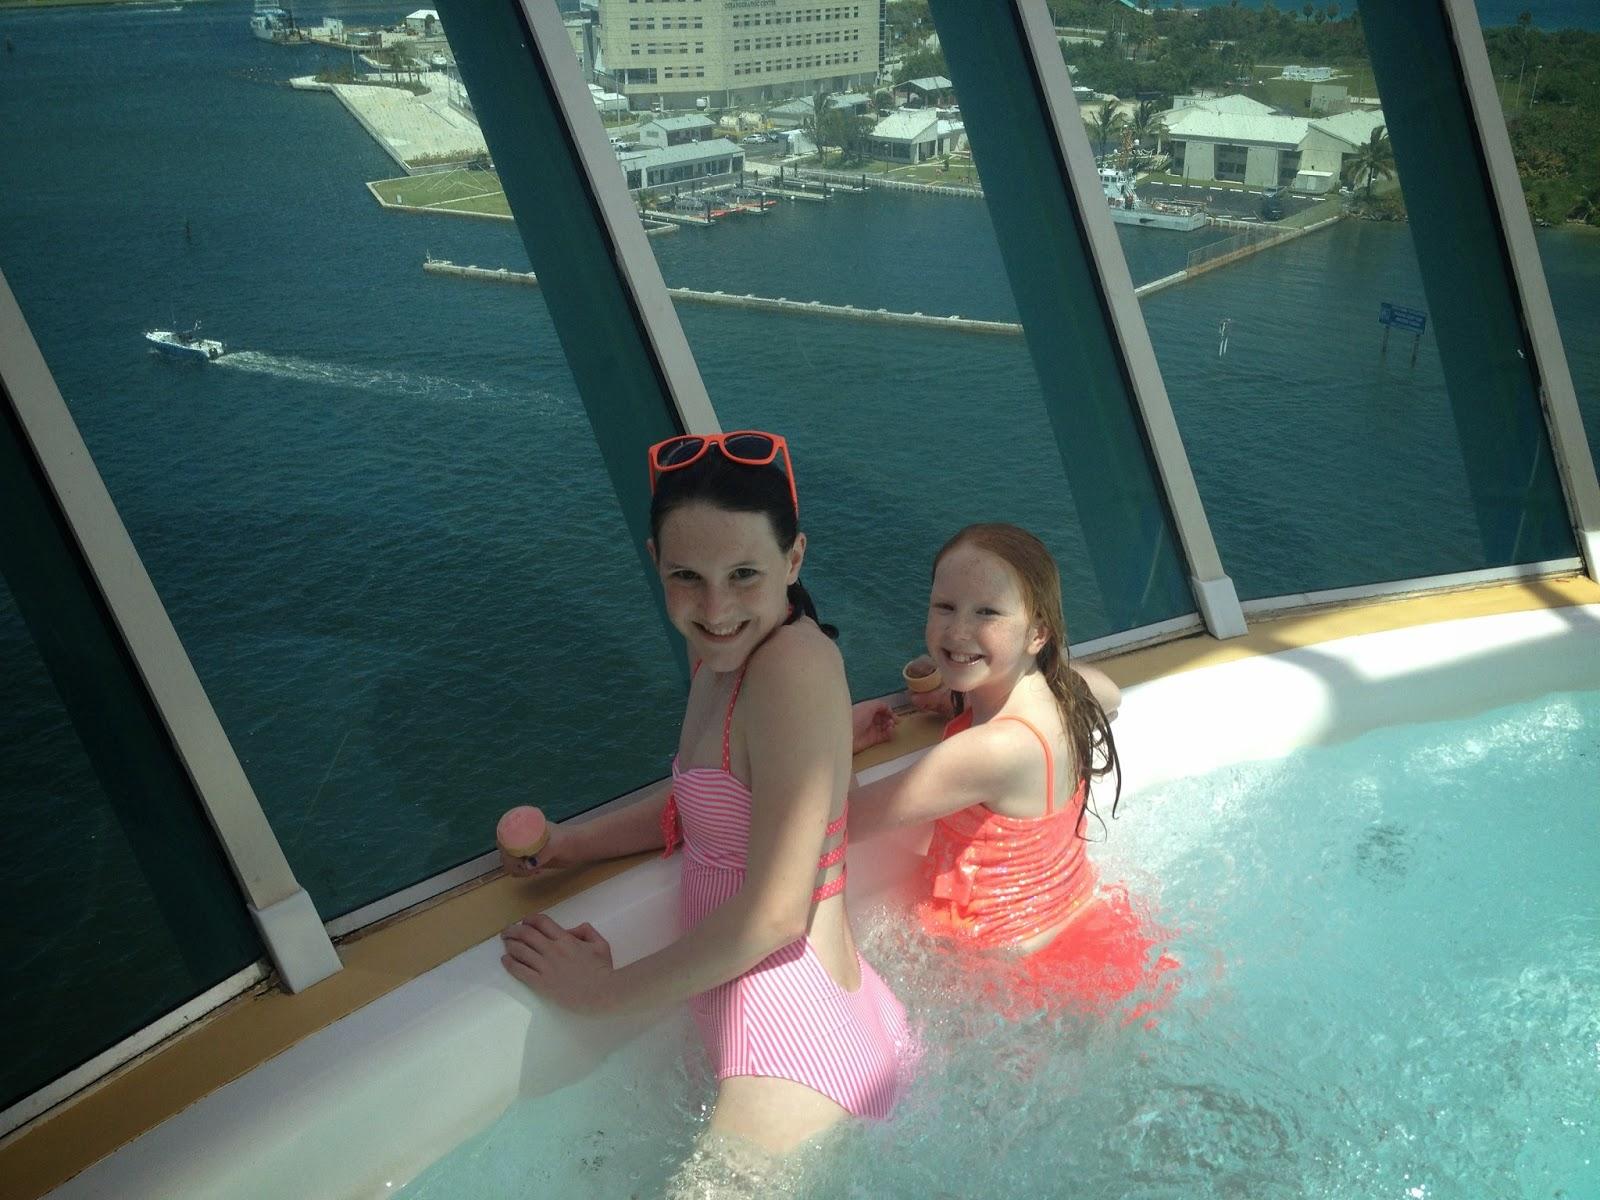 Girls on cruise ship